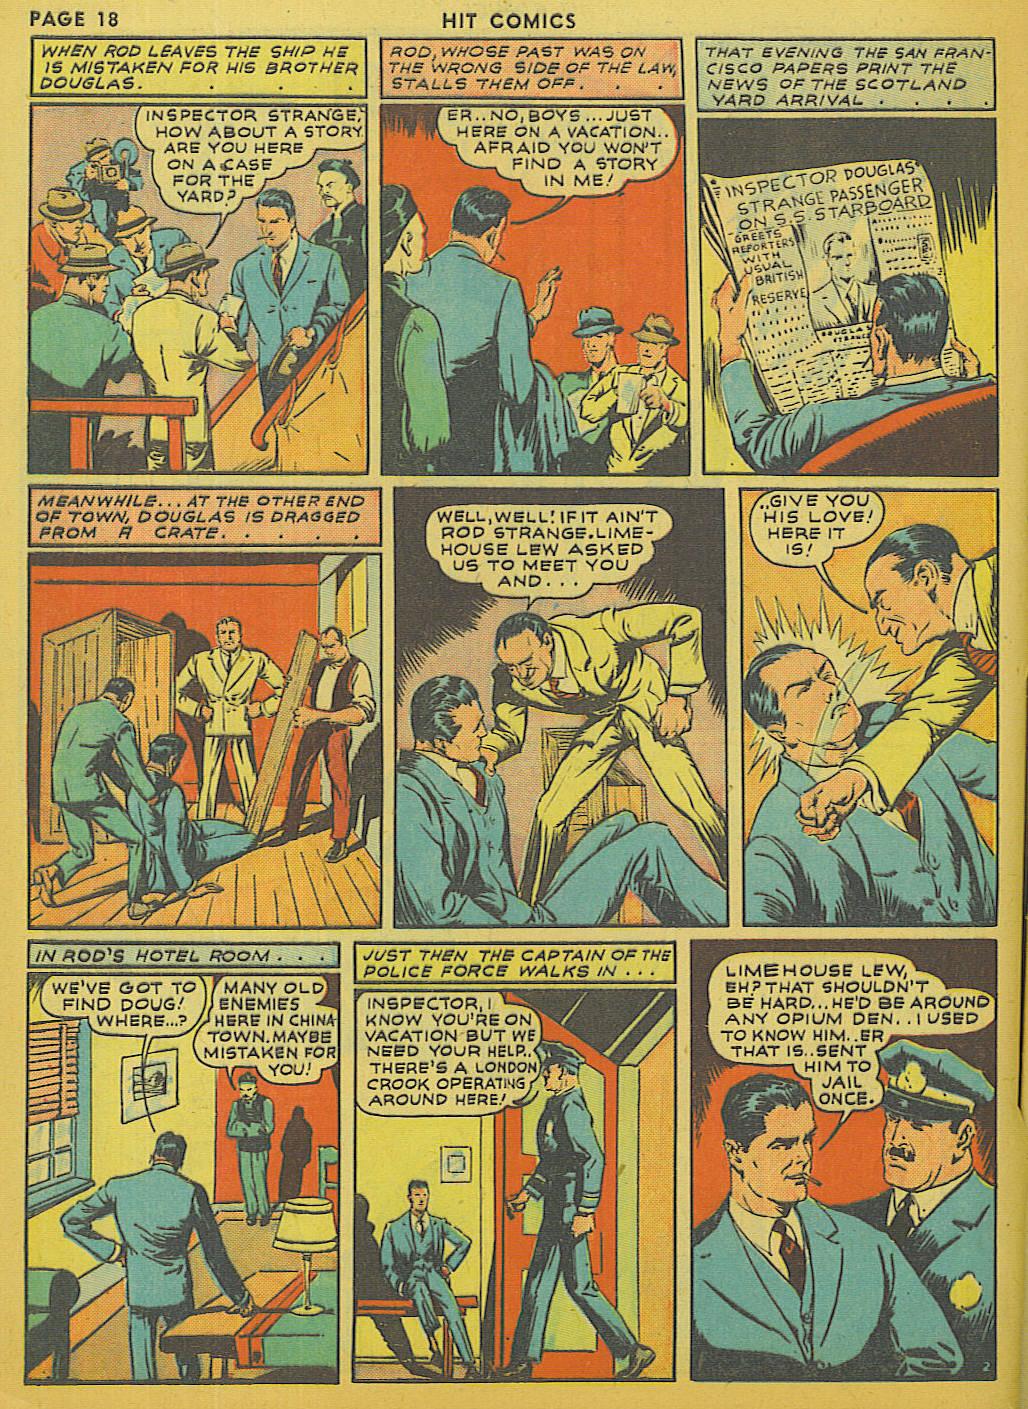 Read online Hit Comics comic -  Issue #13 - 20